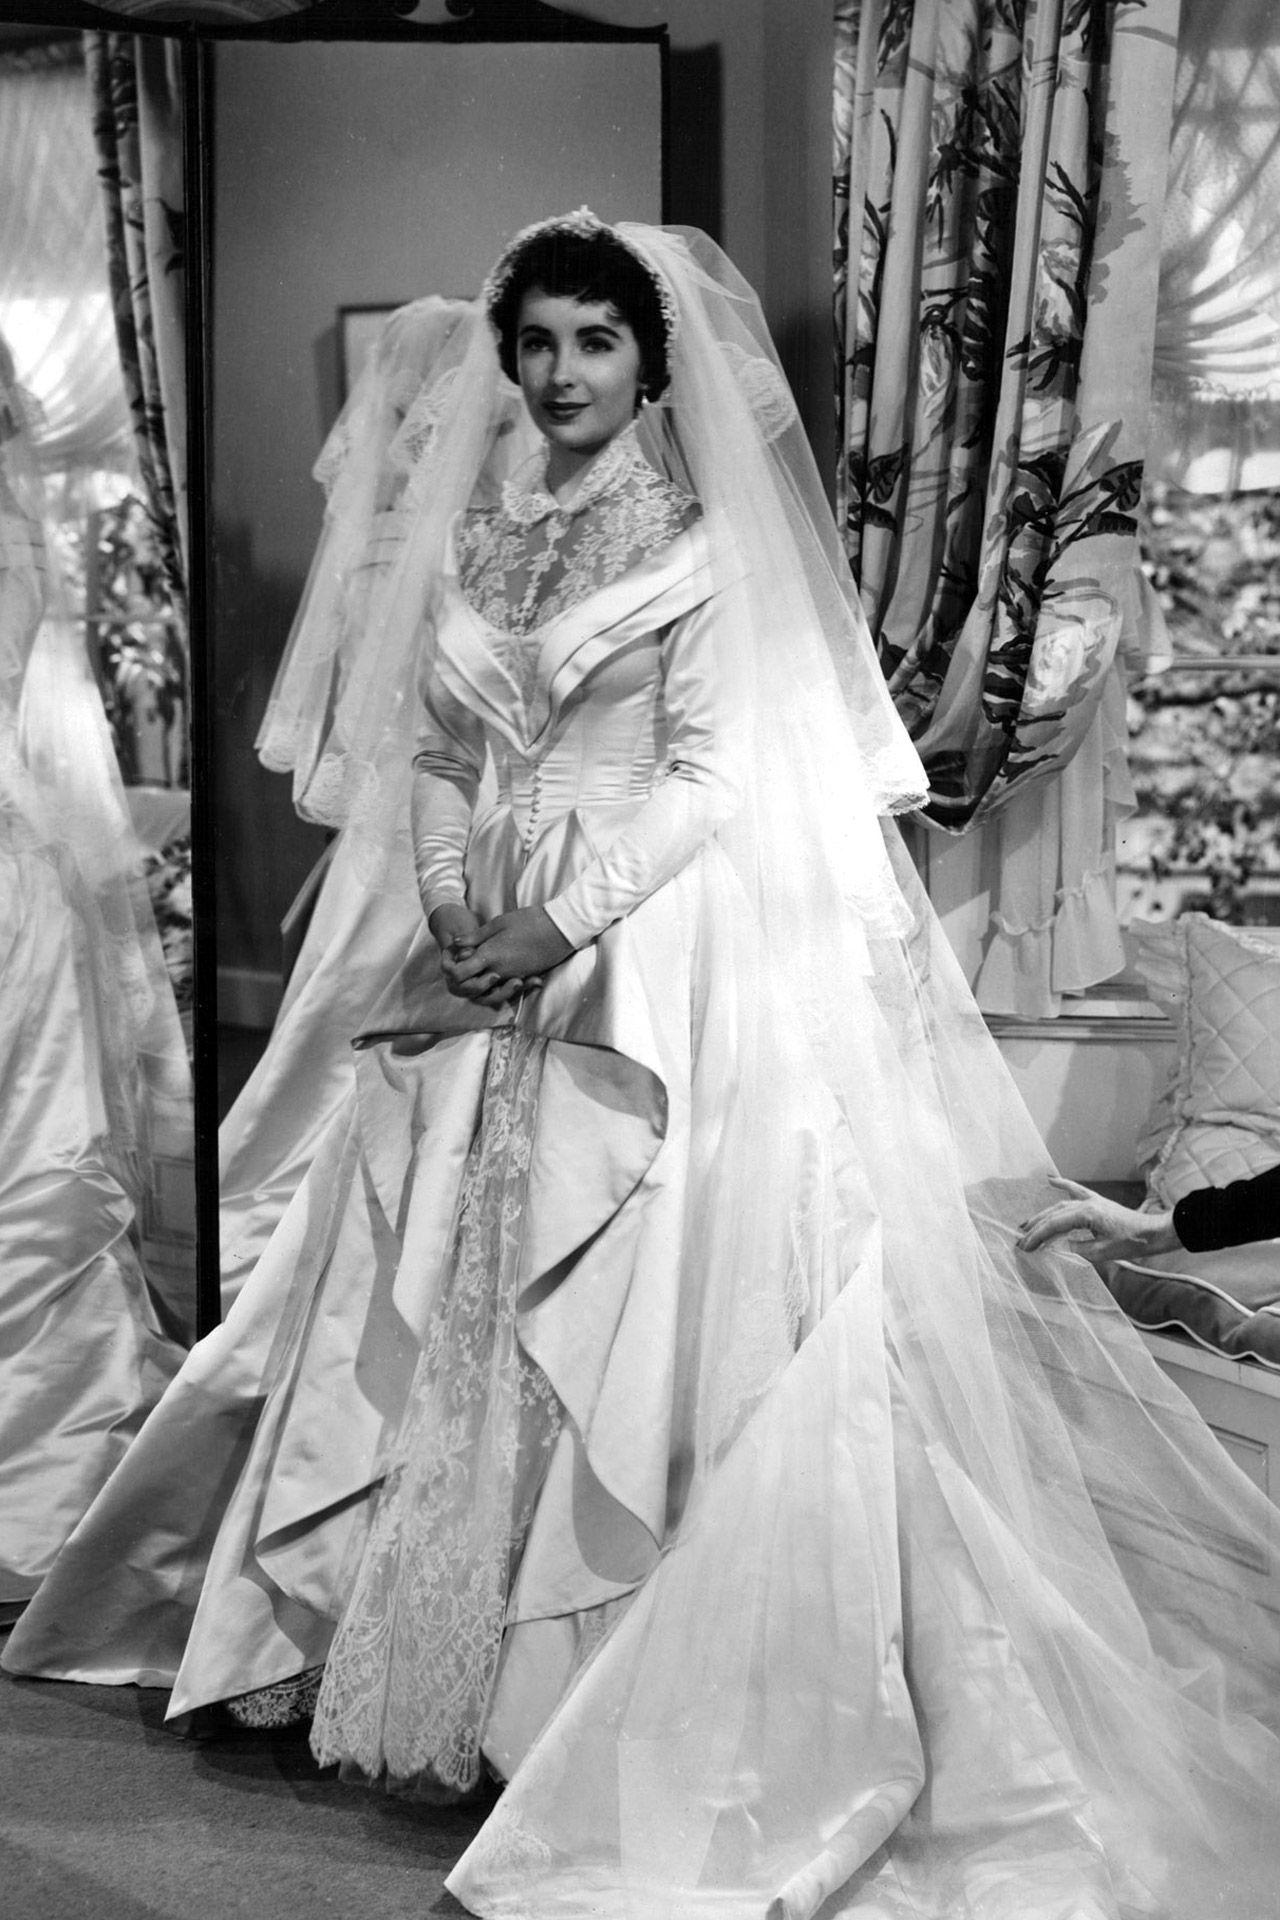 Wedding Ideas, Planning & Inspiration Famous wedding